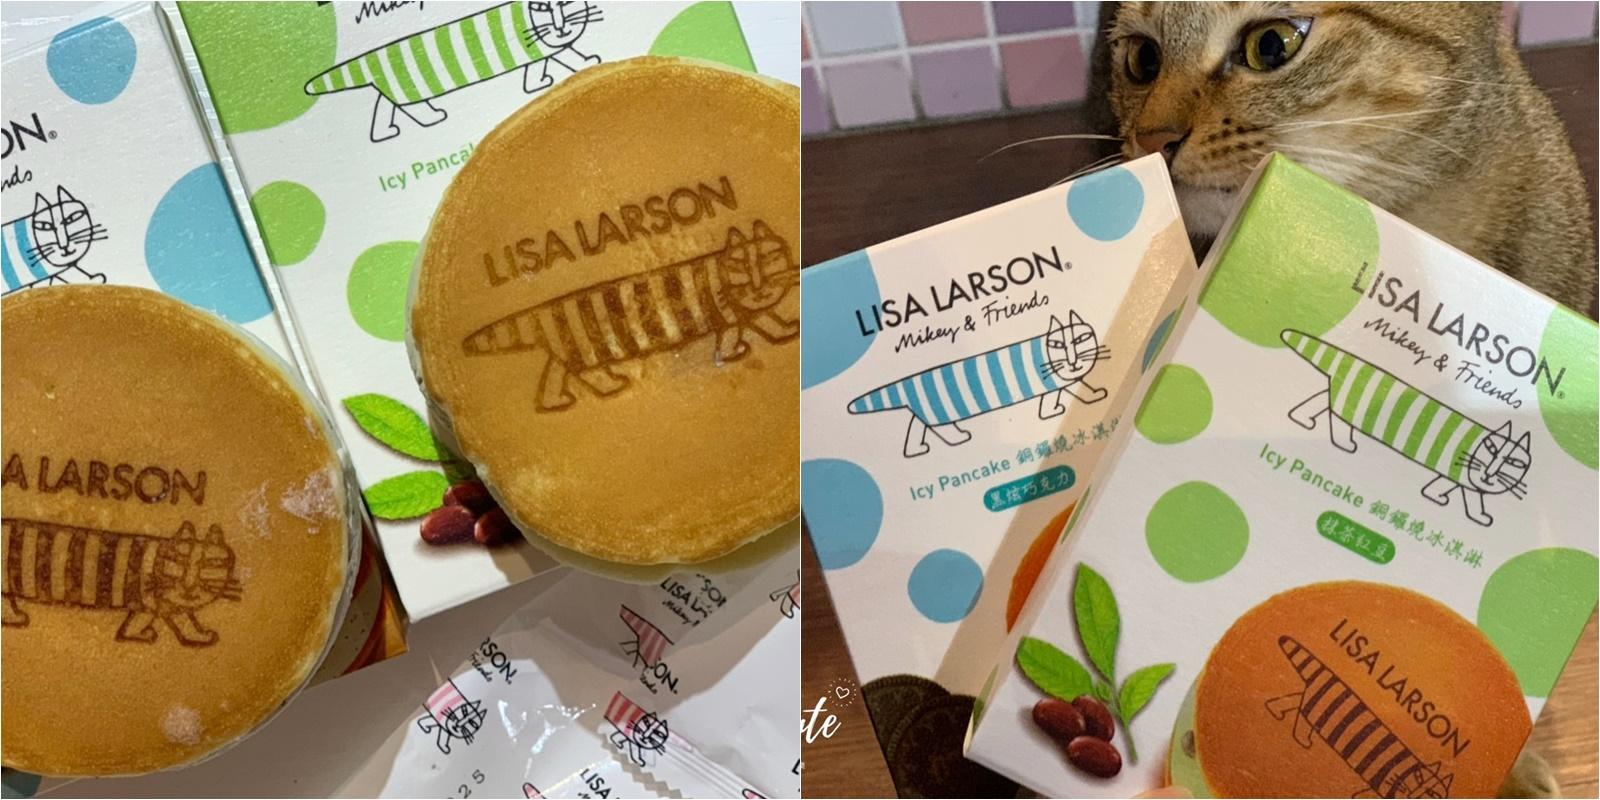 lisa larson銅鑼燒冰淇淋,義美銅鑼燒冰淇淋